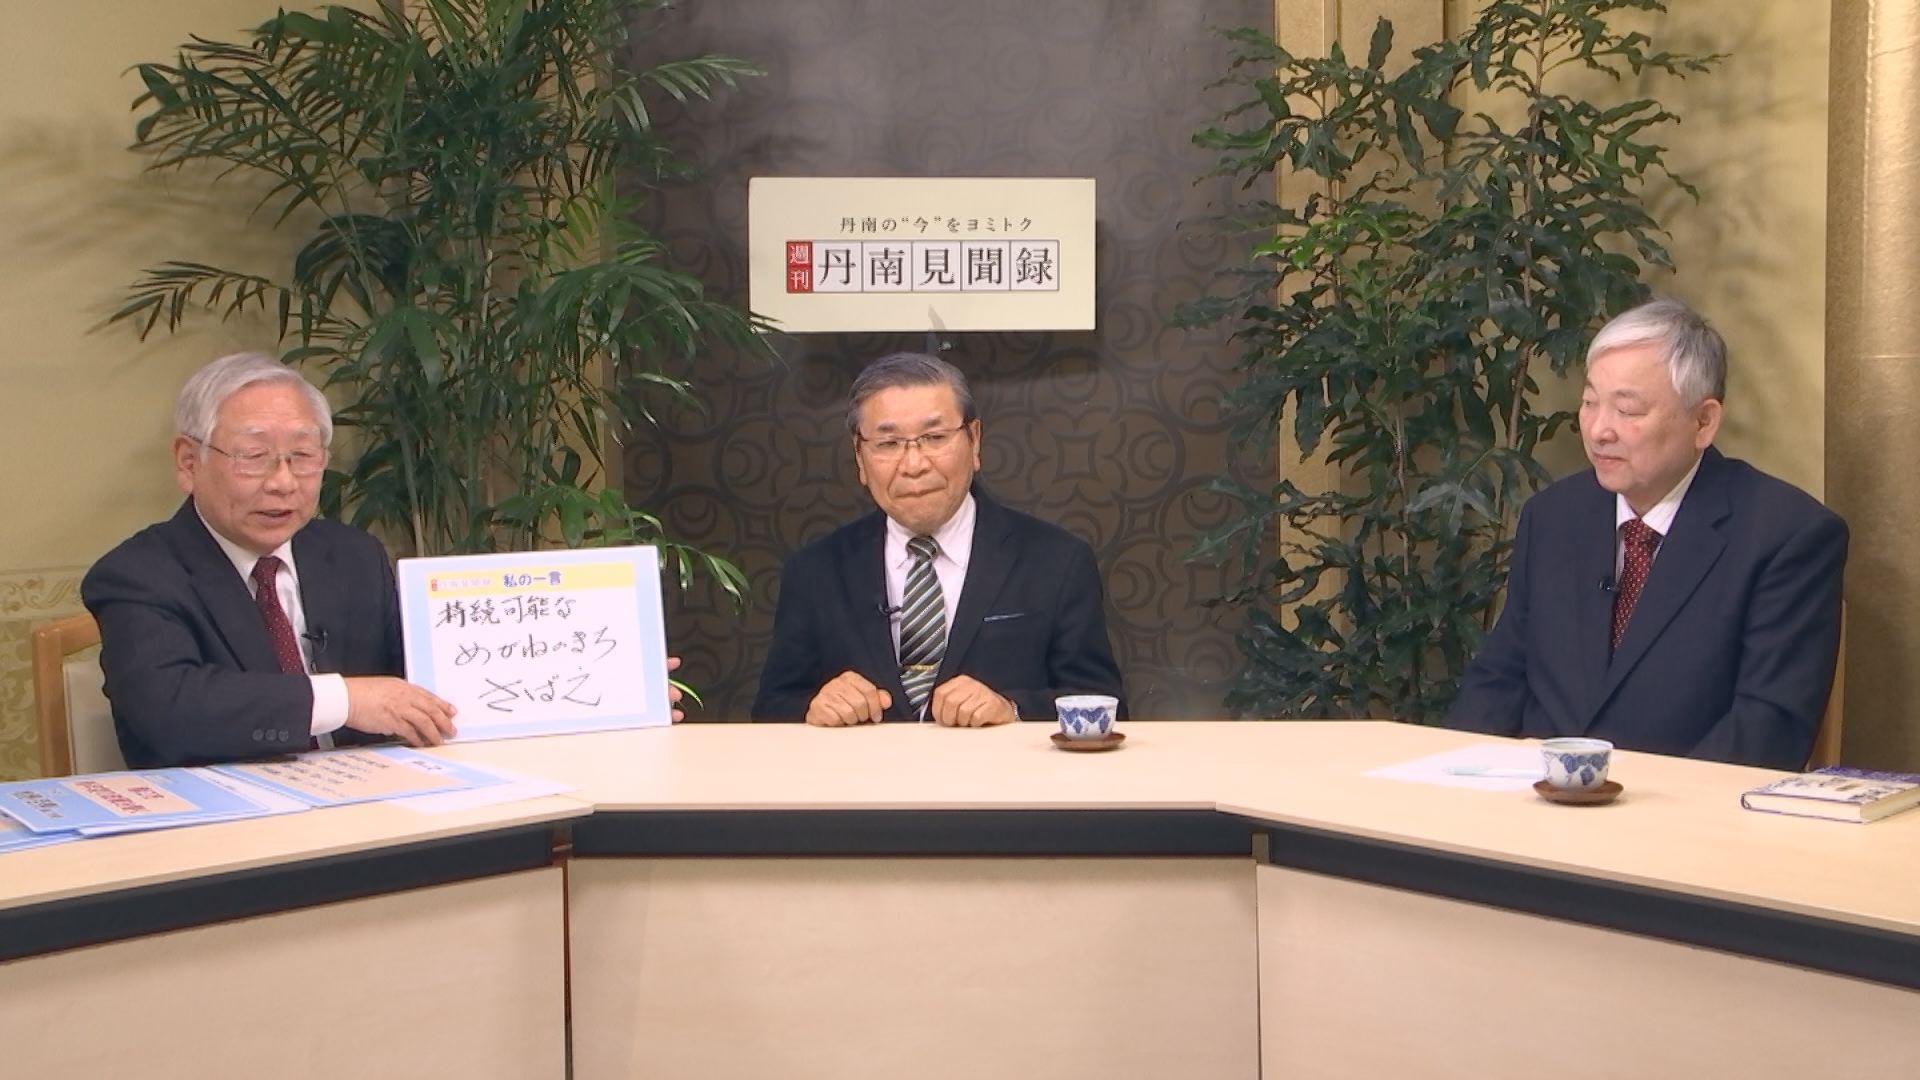 【週刊 丹南見聞録】鯖江市 新年度の政策を聞く